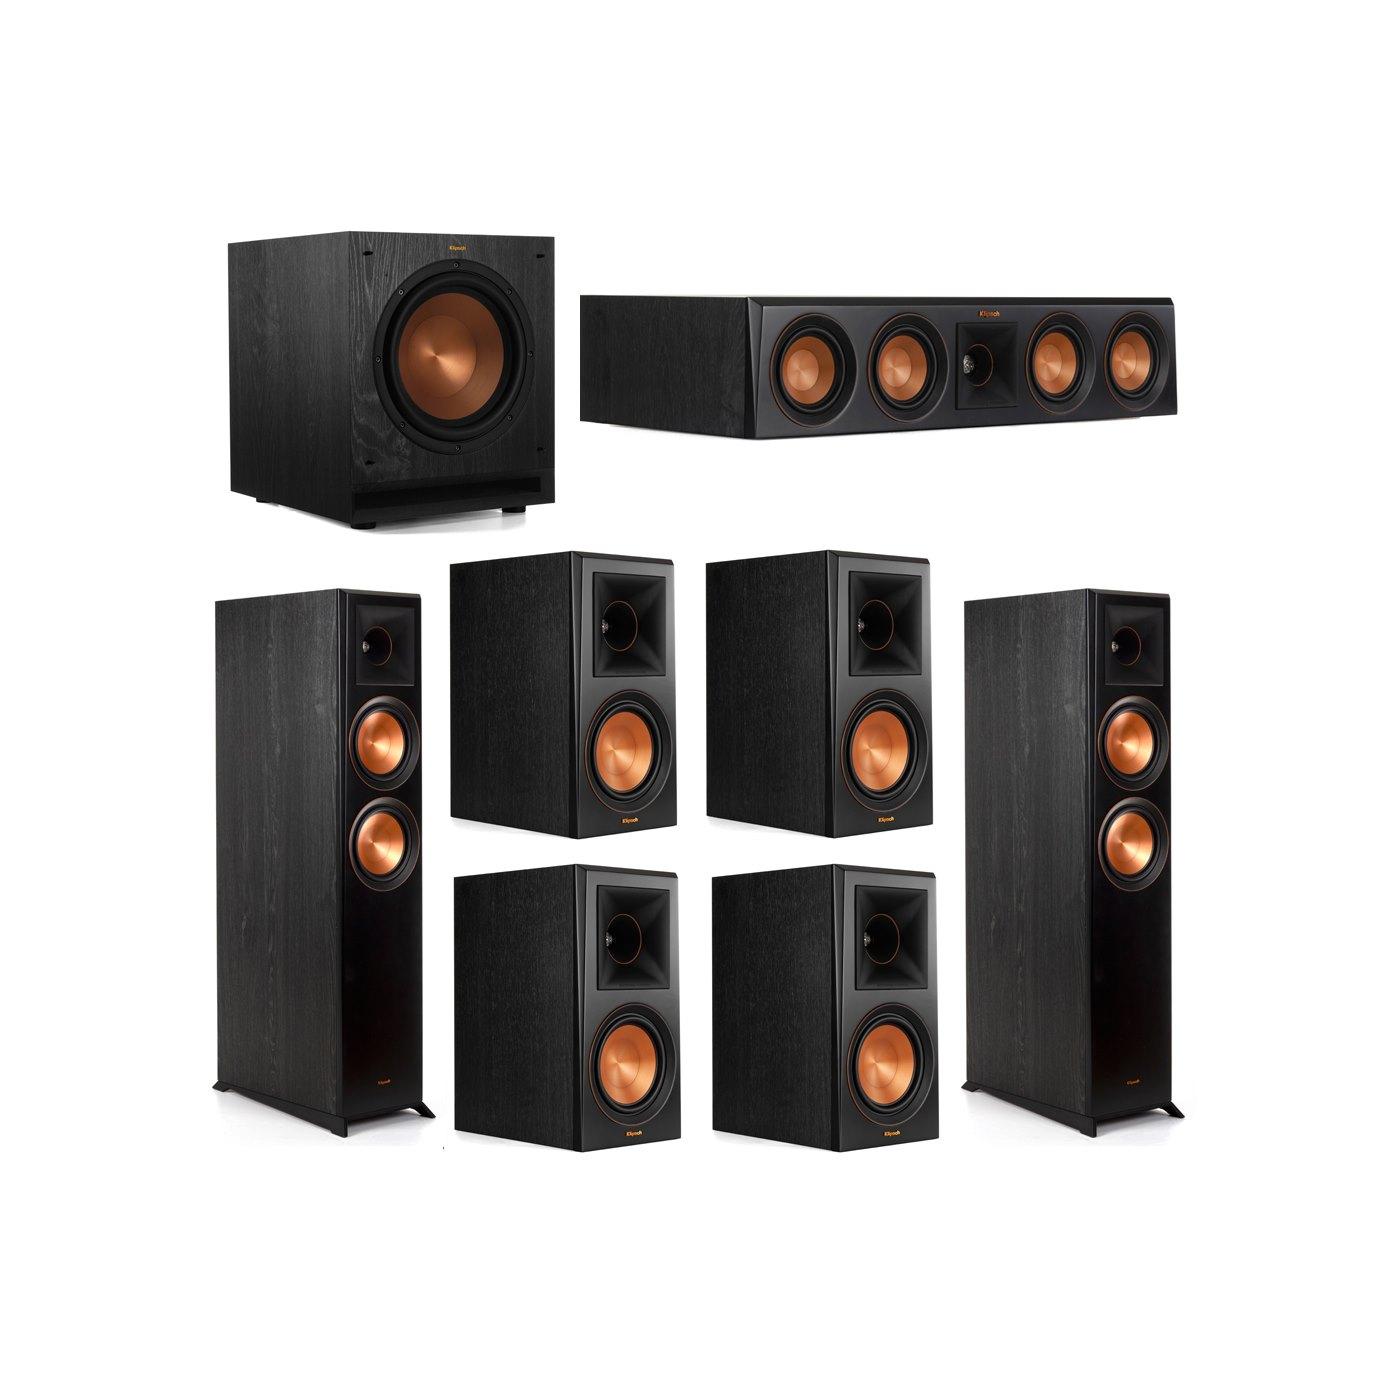 Klipsch 7.1 System with 2 RP-6000F Floorstanding Speakers, 1 Klipsch RP-404C Center Speaker, 4 Klipsch RP-600M Surround Speakers, 1 Klipsch SPL-100 Subwoofer